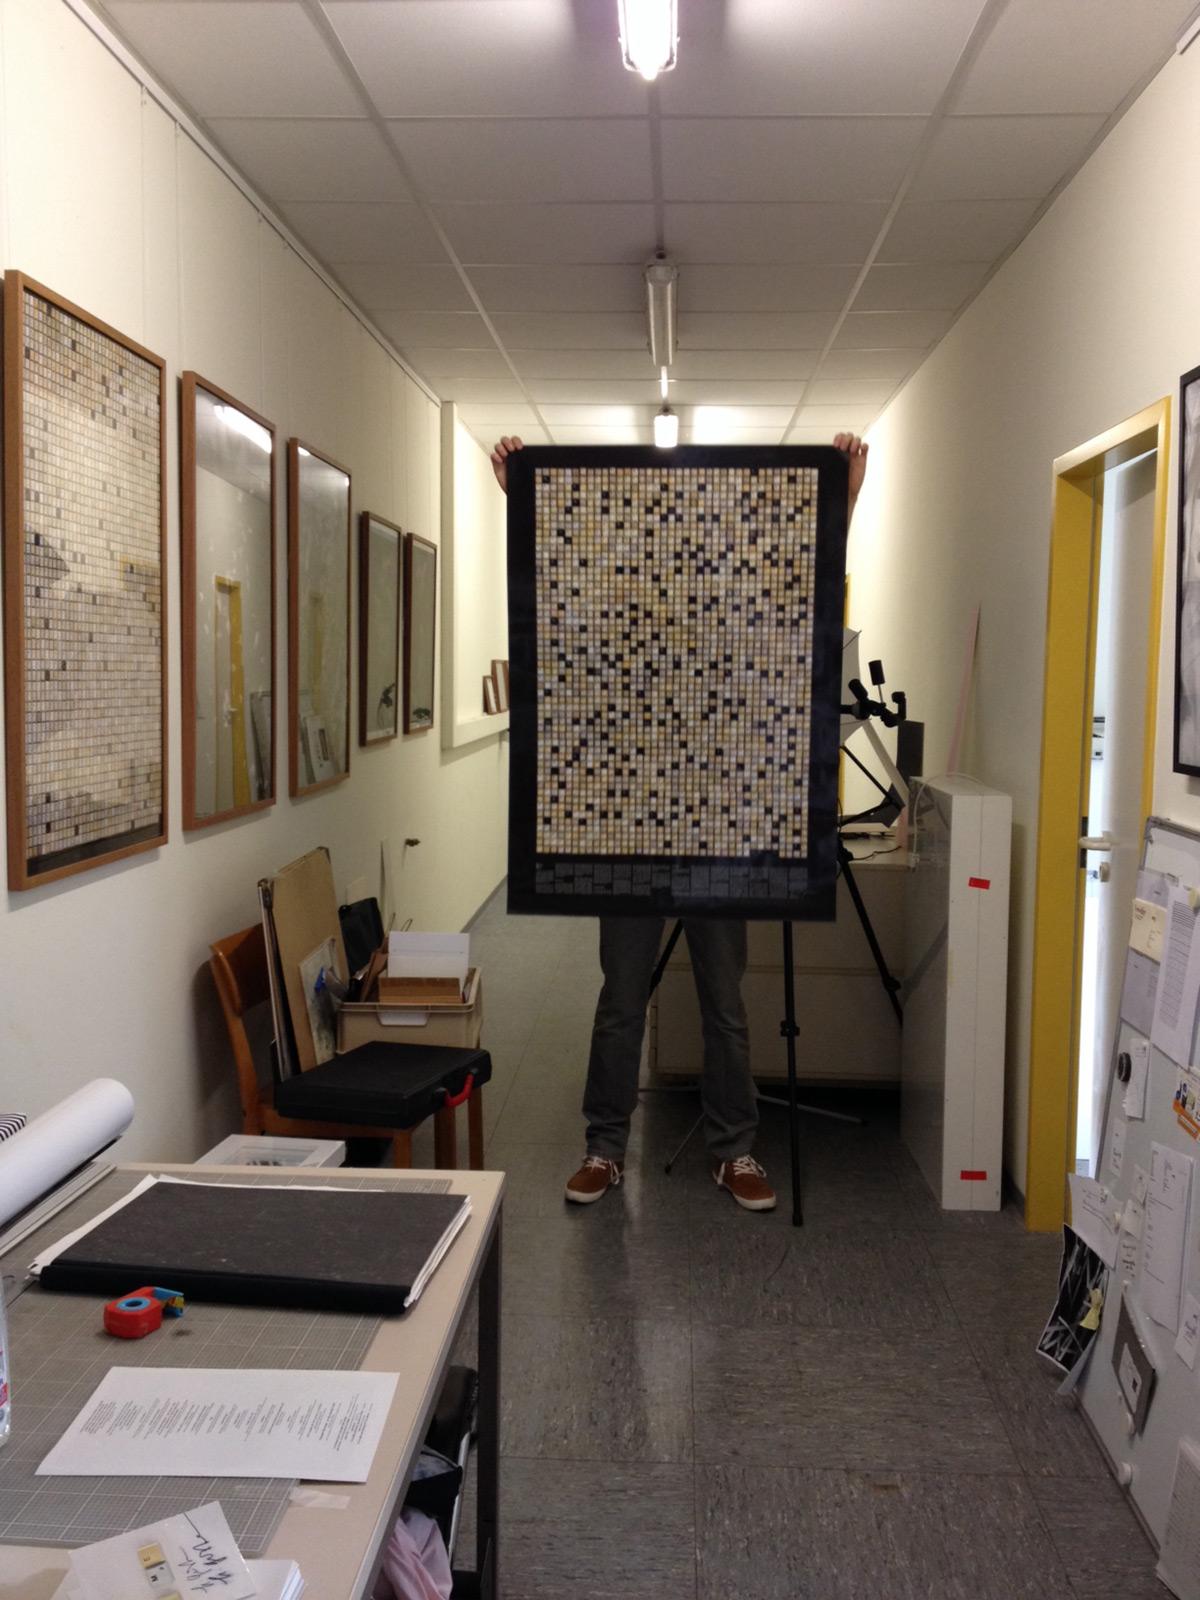 Holding 2014 Typographic Wall Calendar in Studio